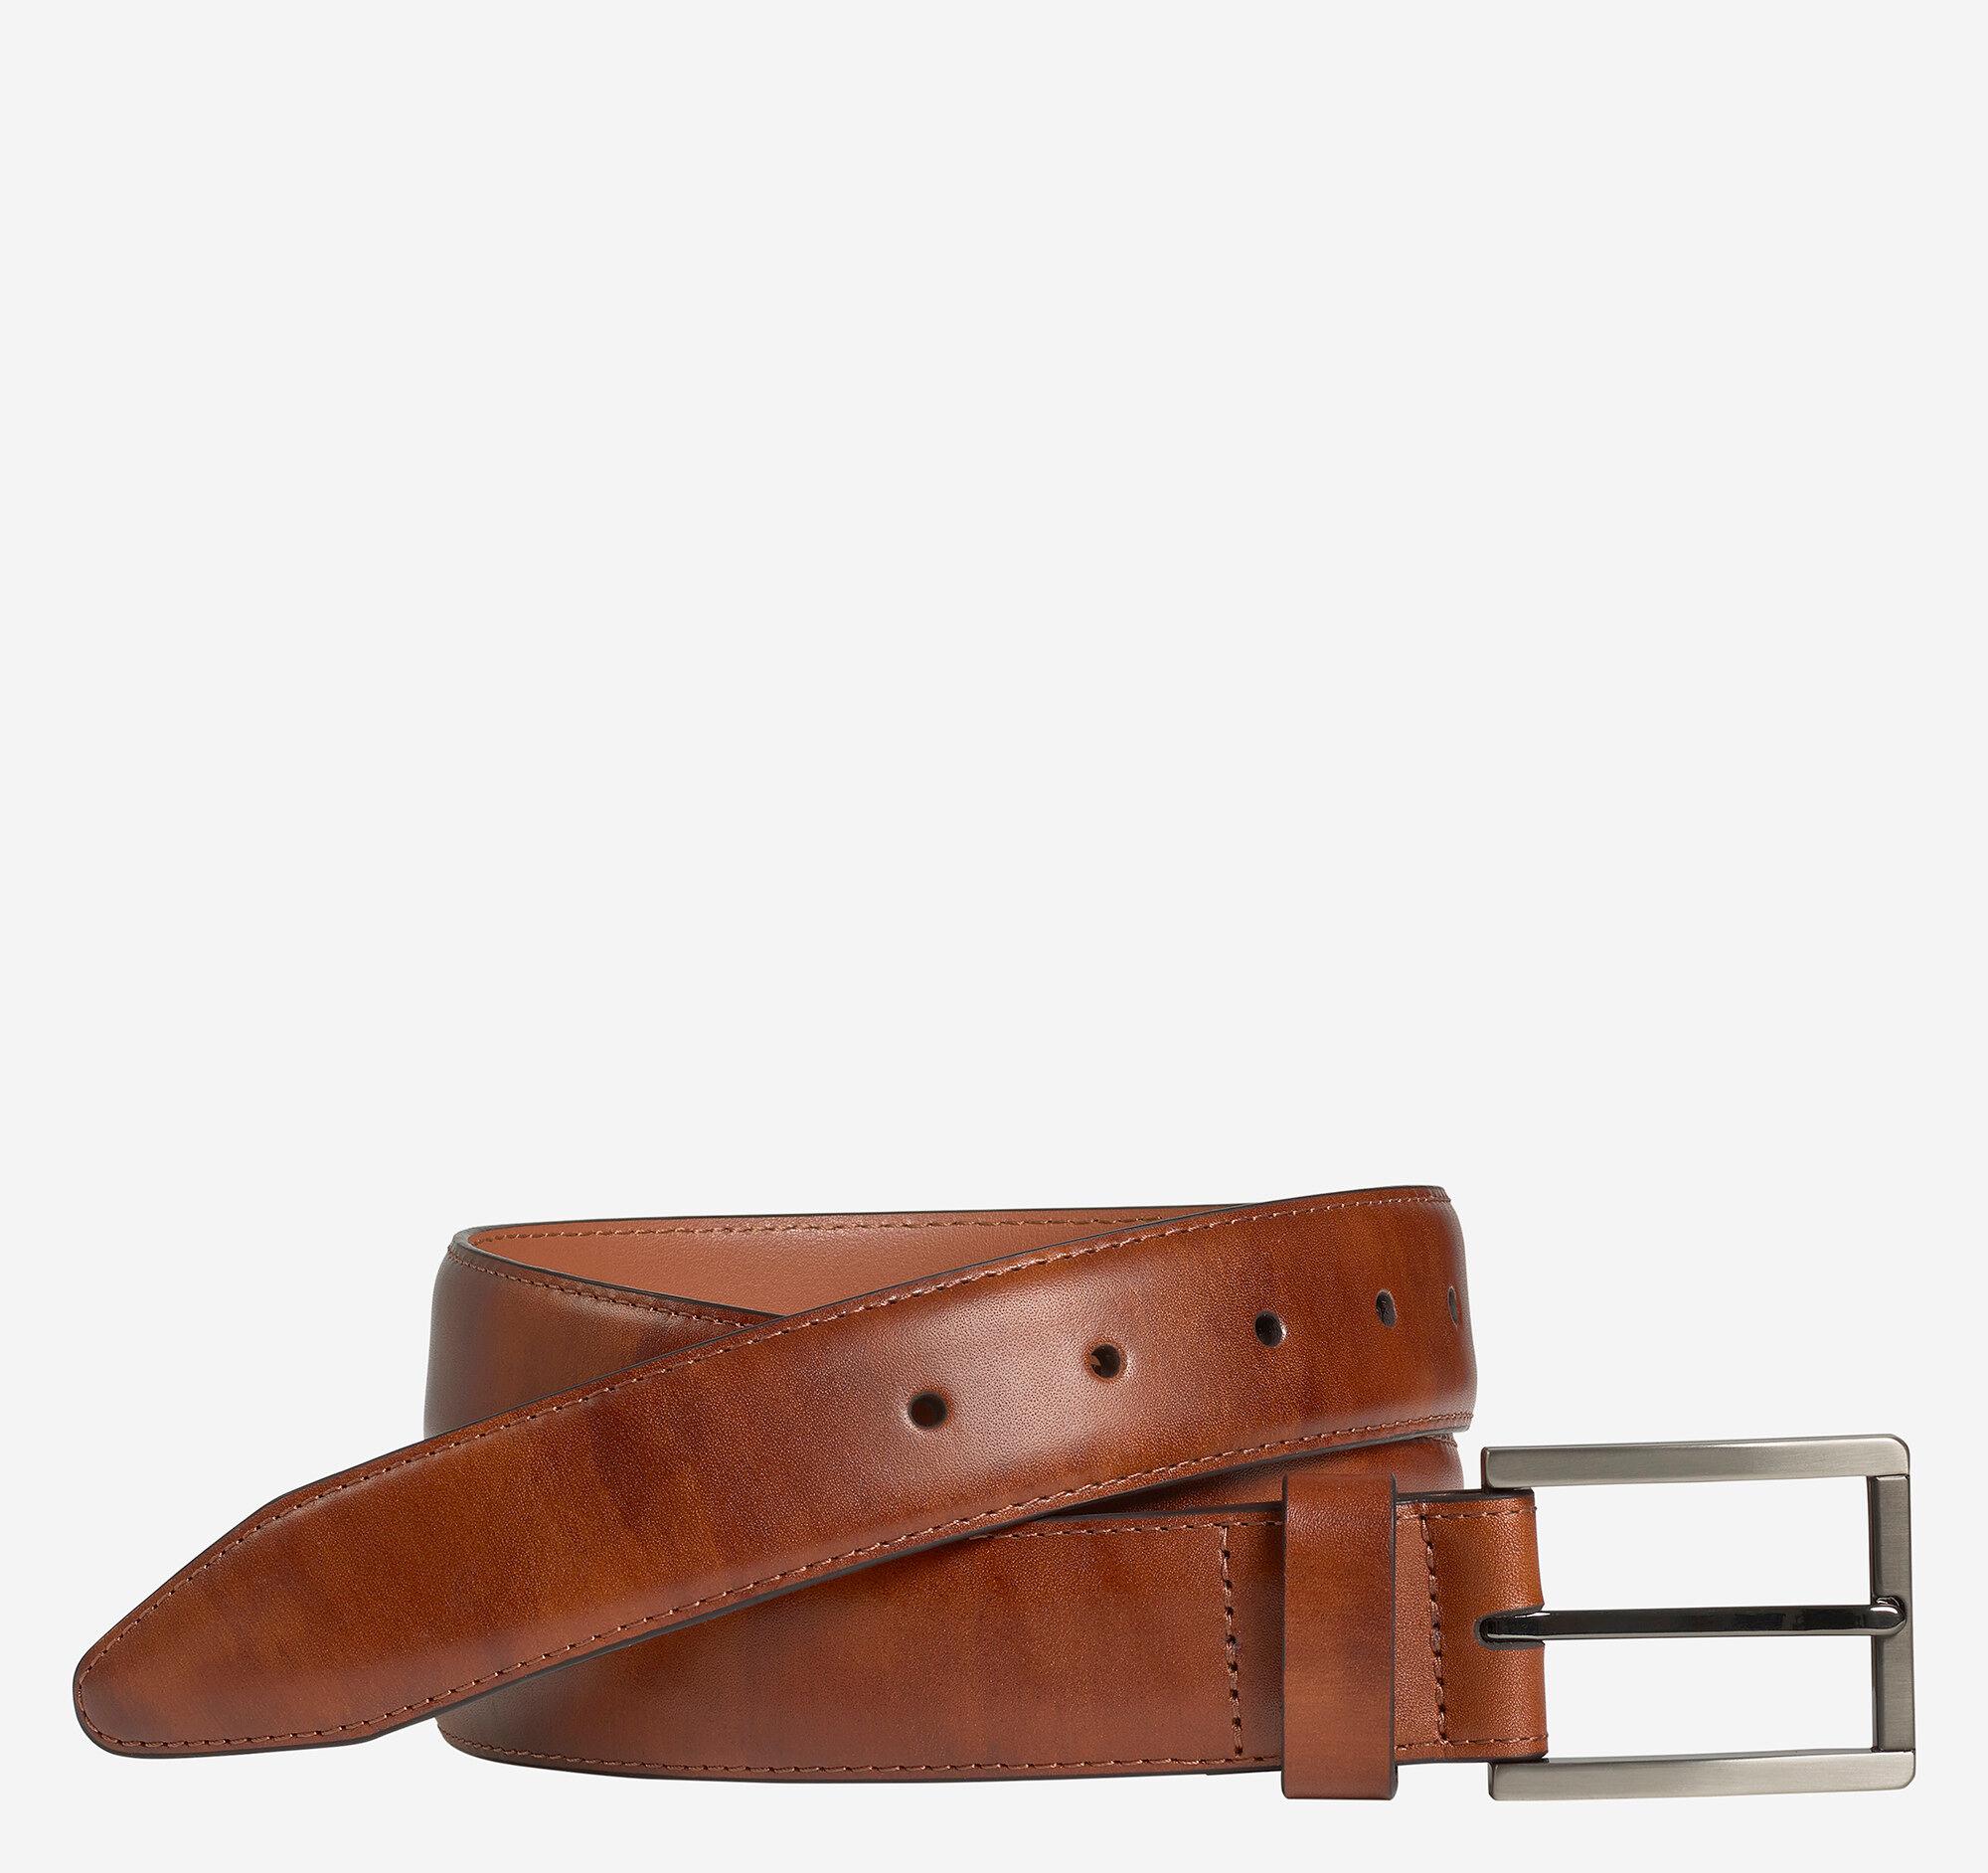 Johnston & Murphy Men's Feather Edge Tonal Belt - Brown - Size 40